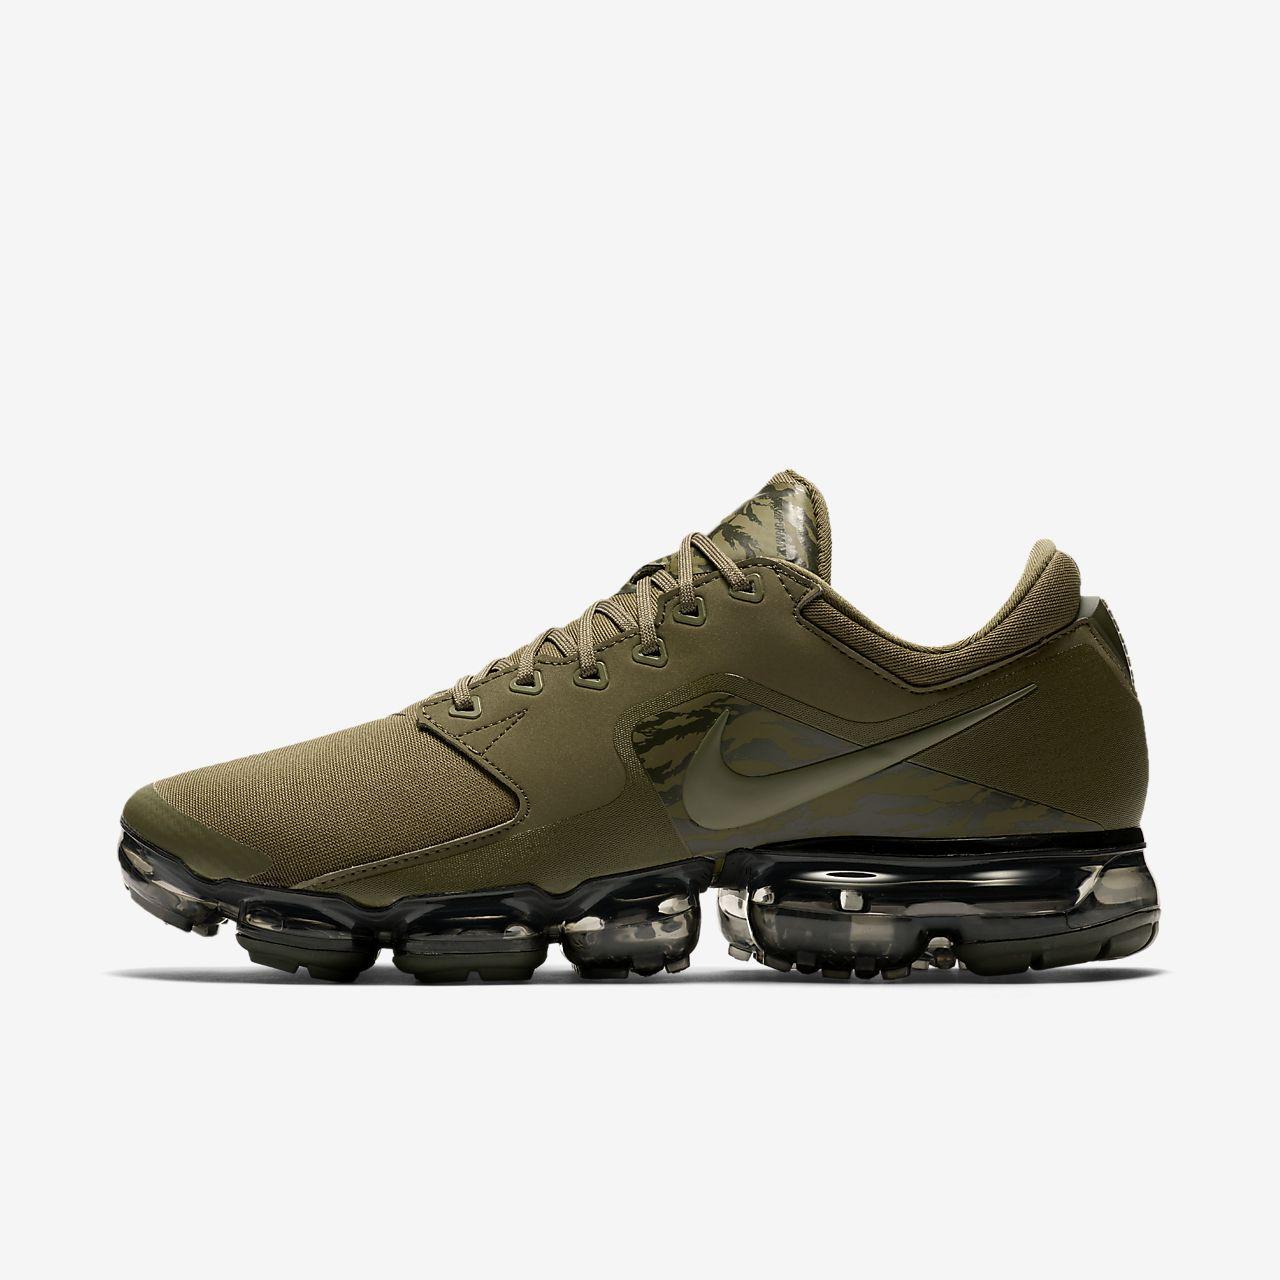 82701e7aa74 Chaussure de running Nike Air VaporMax pour Homme. Nike.com BE